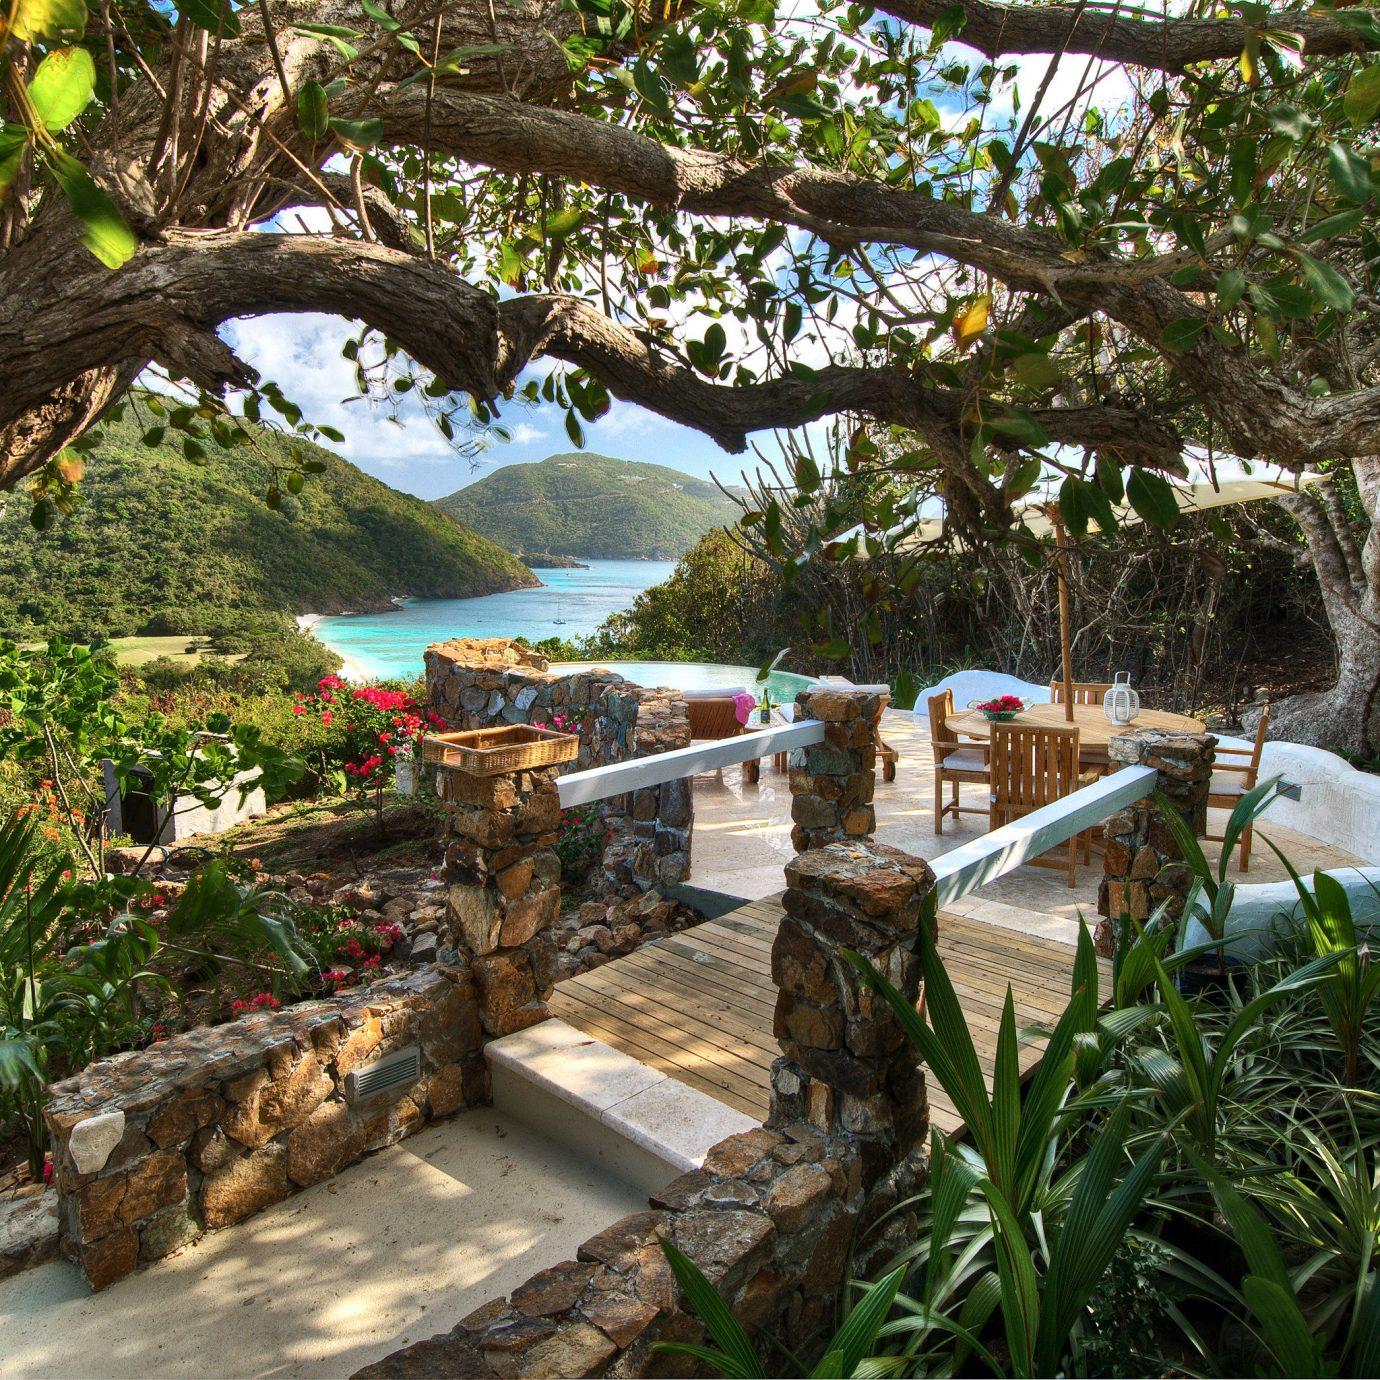 Beach Beachfront Classic Grounds Hotels Luxury Travel Scenic views Waterfront tree plant flora botany Resort Jungle Garden rainforest backyard tropics flower cottage